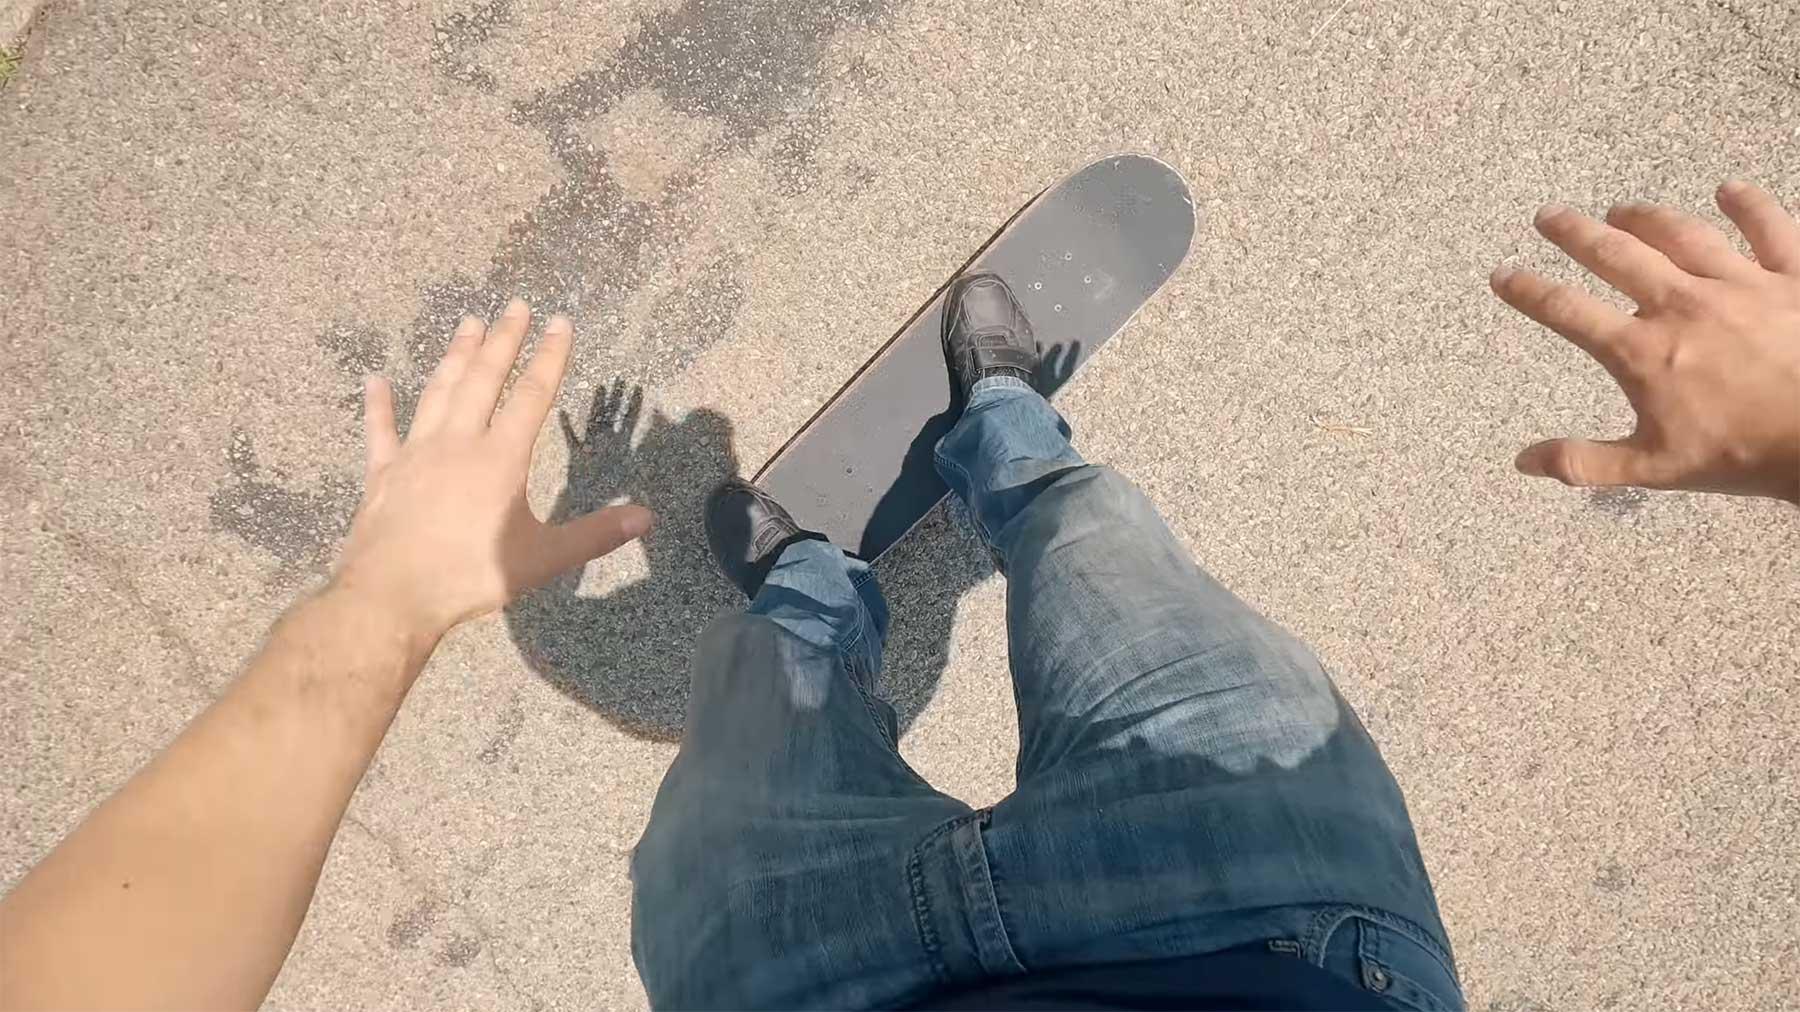 Buttered Side Down lernt Skateboarden buttered-side-down-lernt-skateboarden